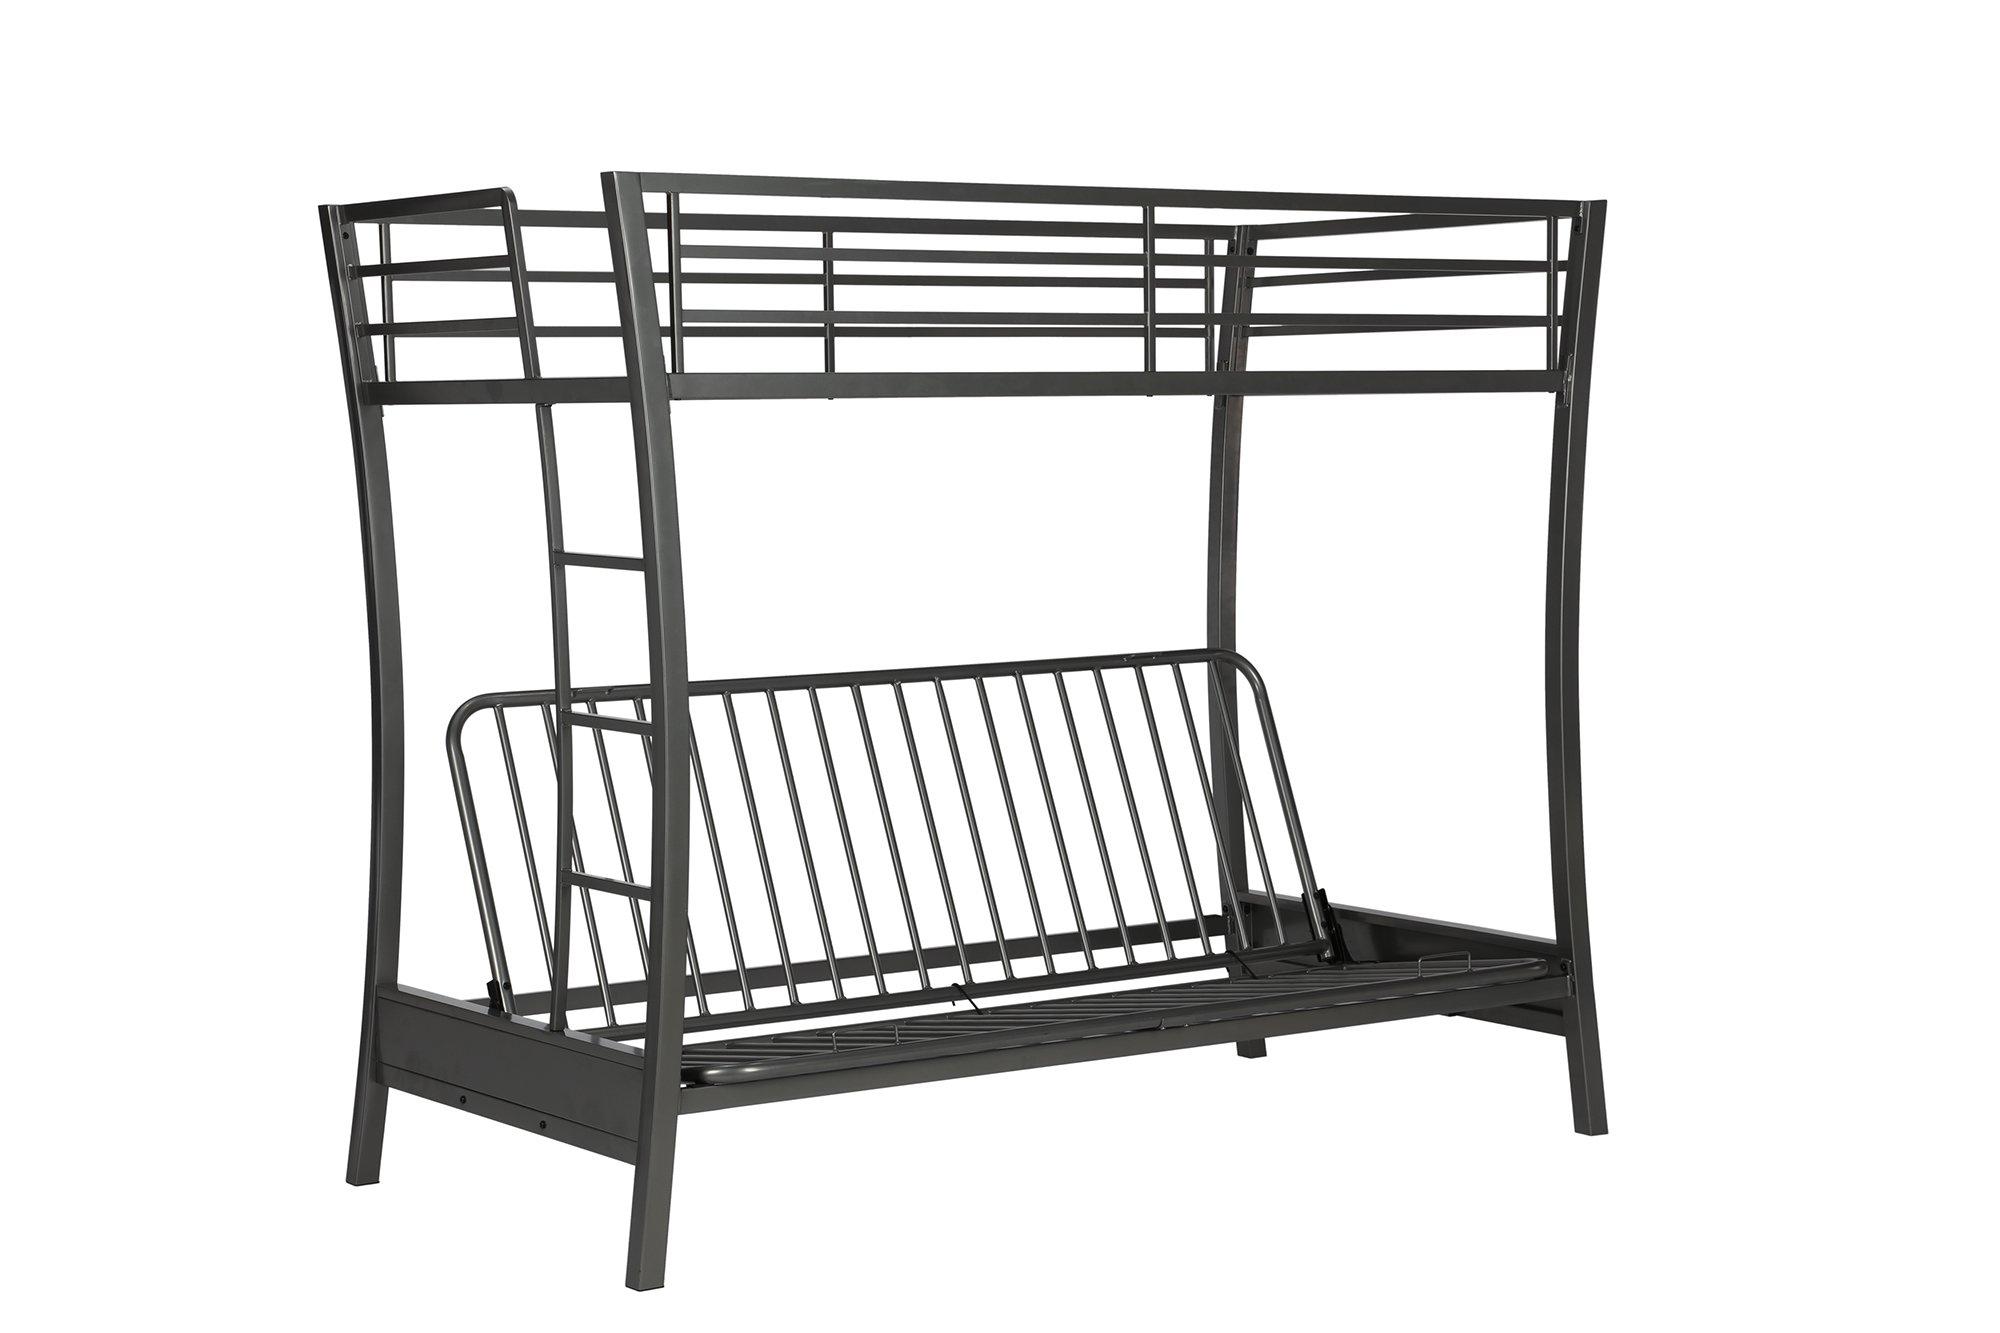 Novogratz Brett Twin Over Full Size Futon Bunk Bed, Multi-functional Design in Sturdy Meta with Sleek Slanted Legs, Includes Metal Slats, Gunmetal Gray